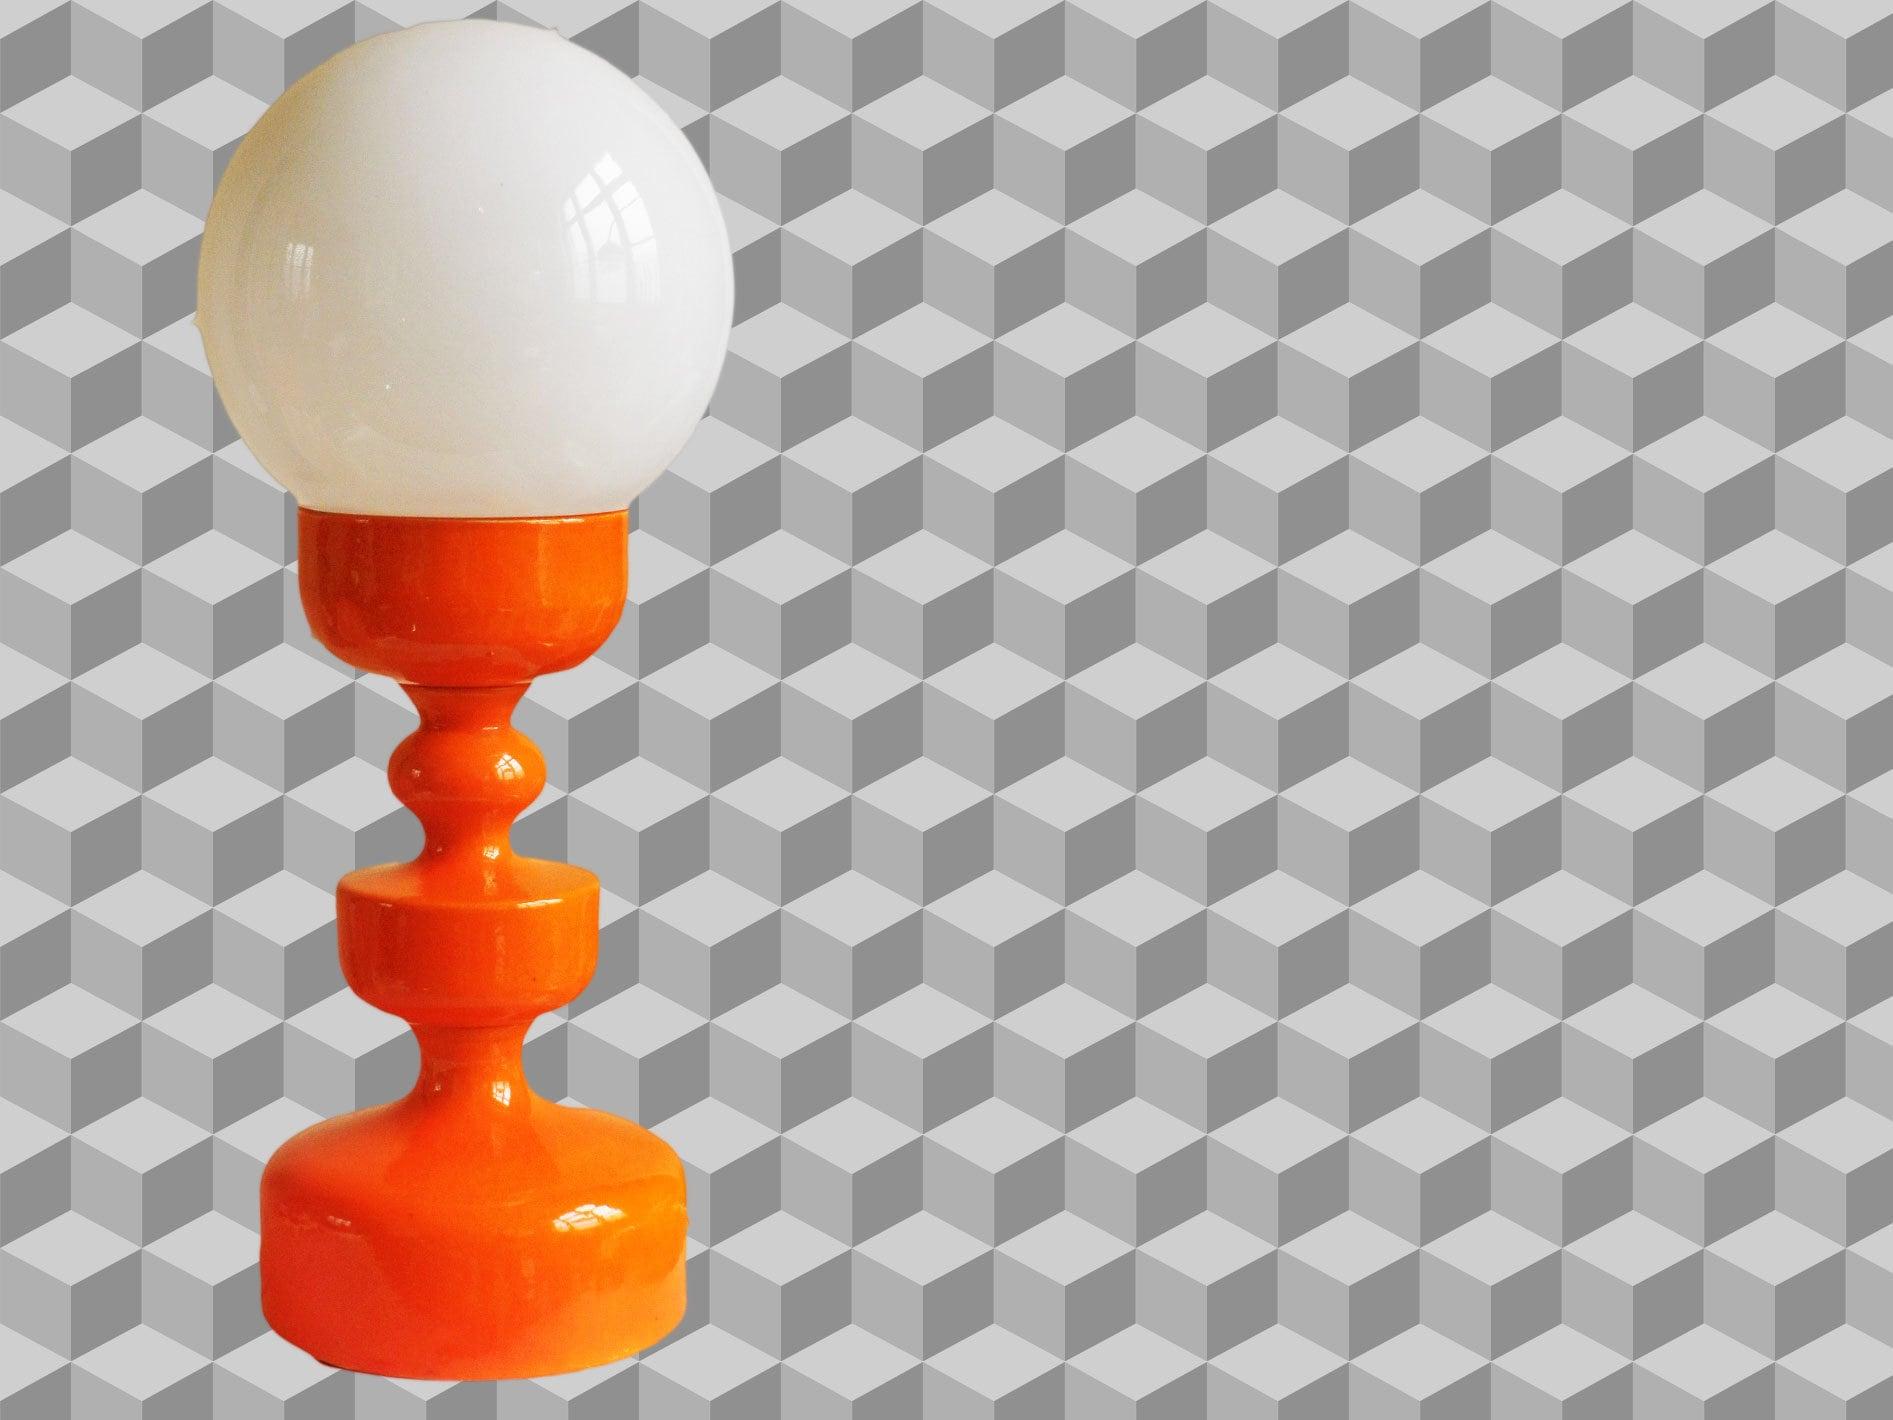 Vintage Orange Ceramic Table Lamp With Glass White Ball A Cari